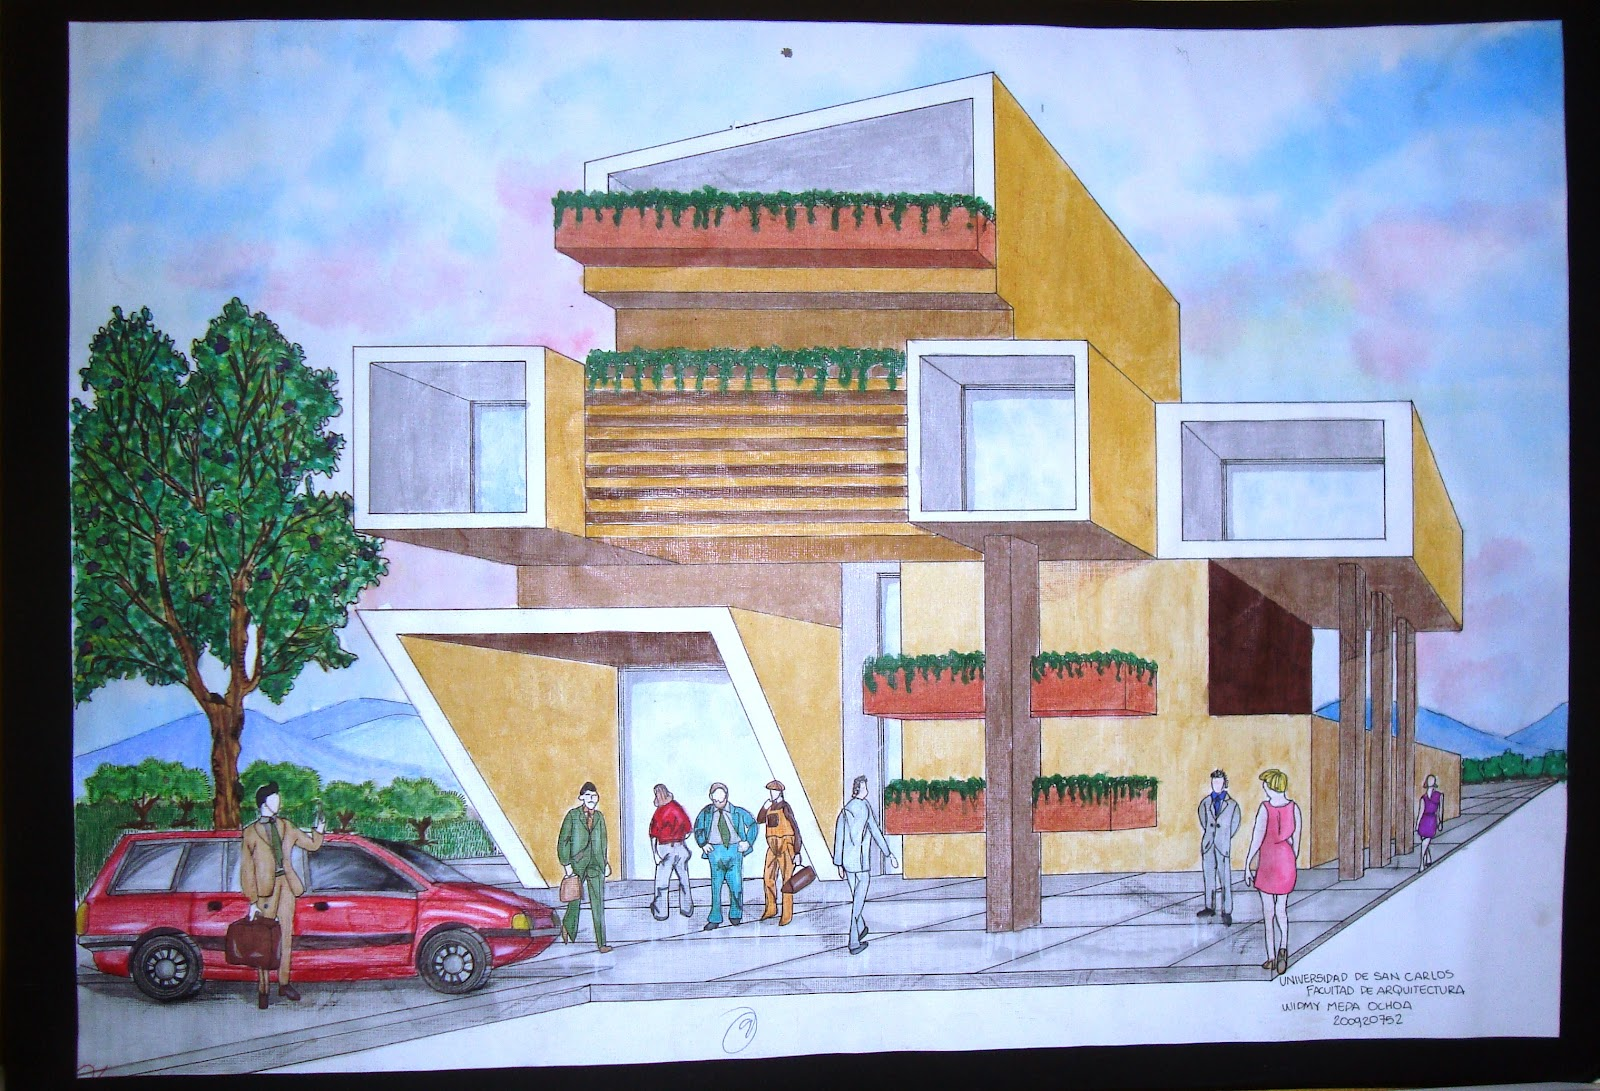 Portafolio dise o arquitectonico 4 presentacion for Donde puedo estudiar arquitectura